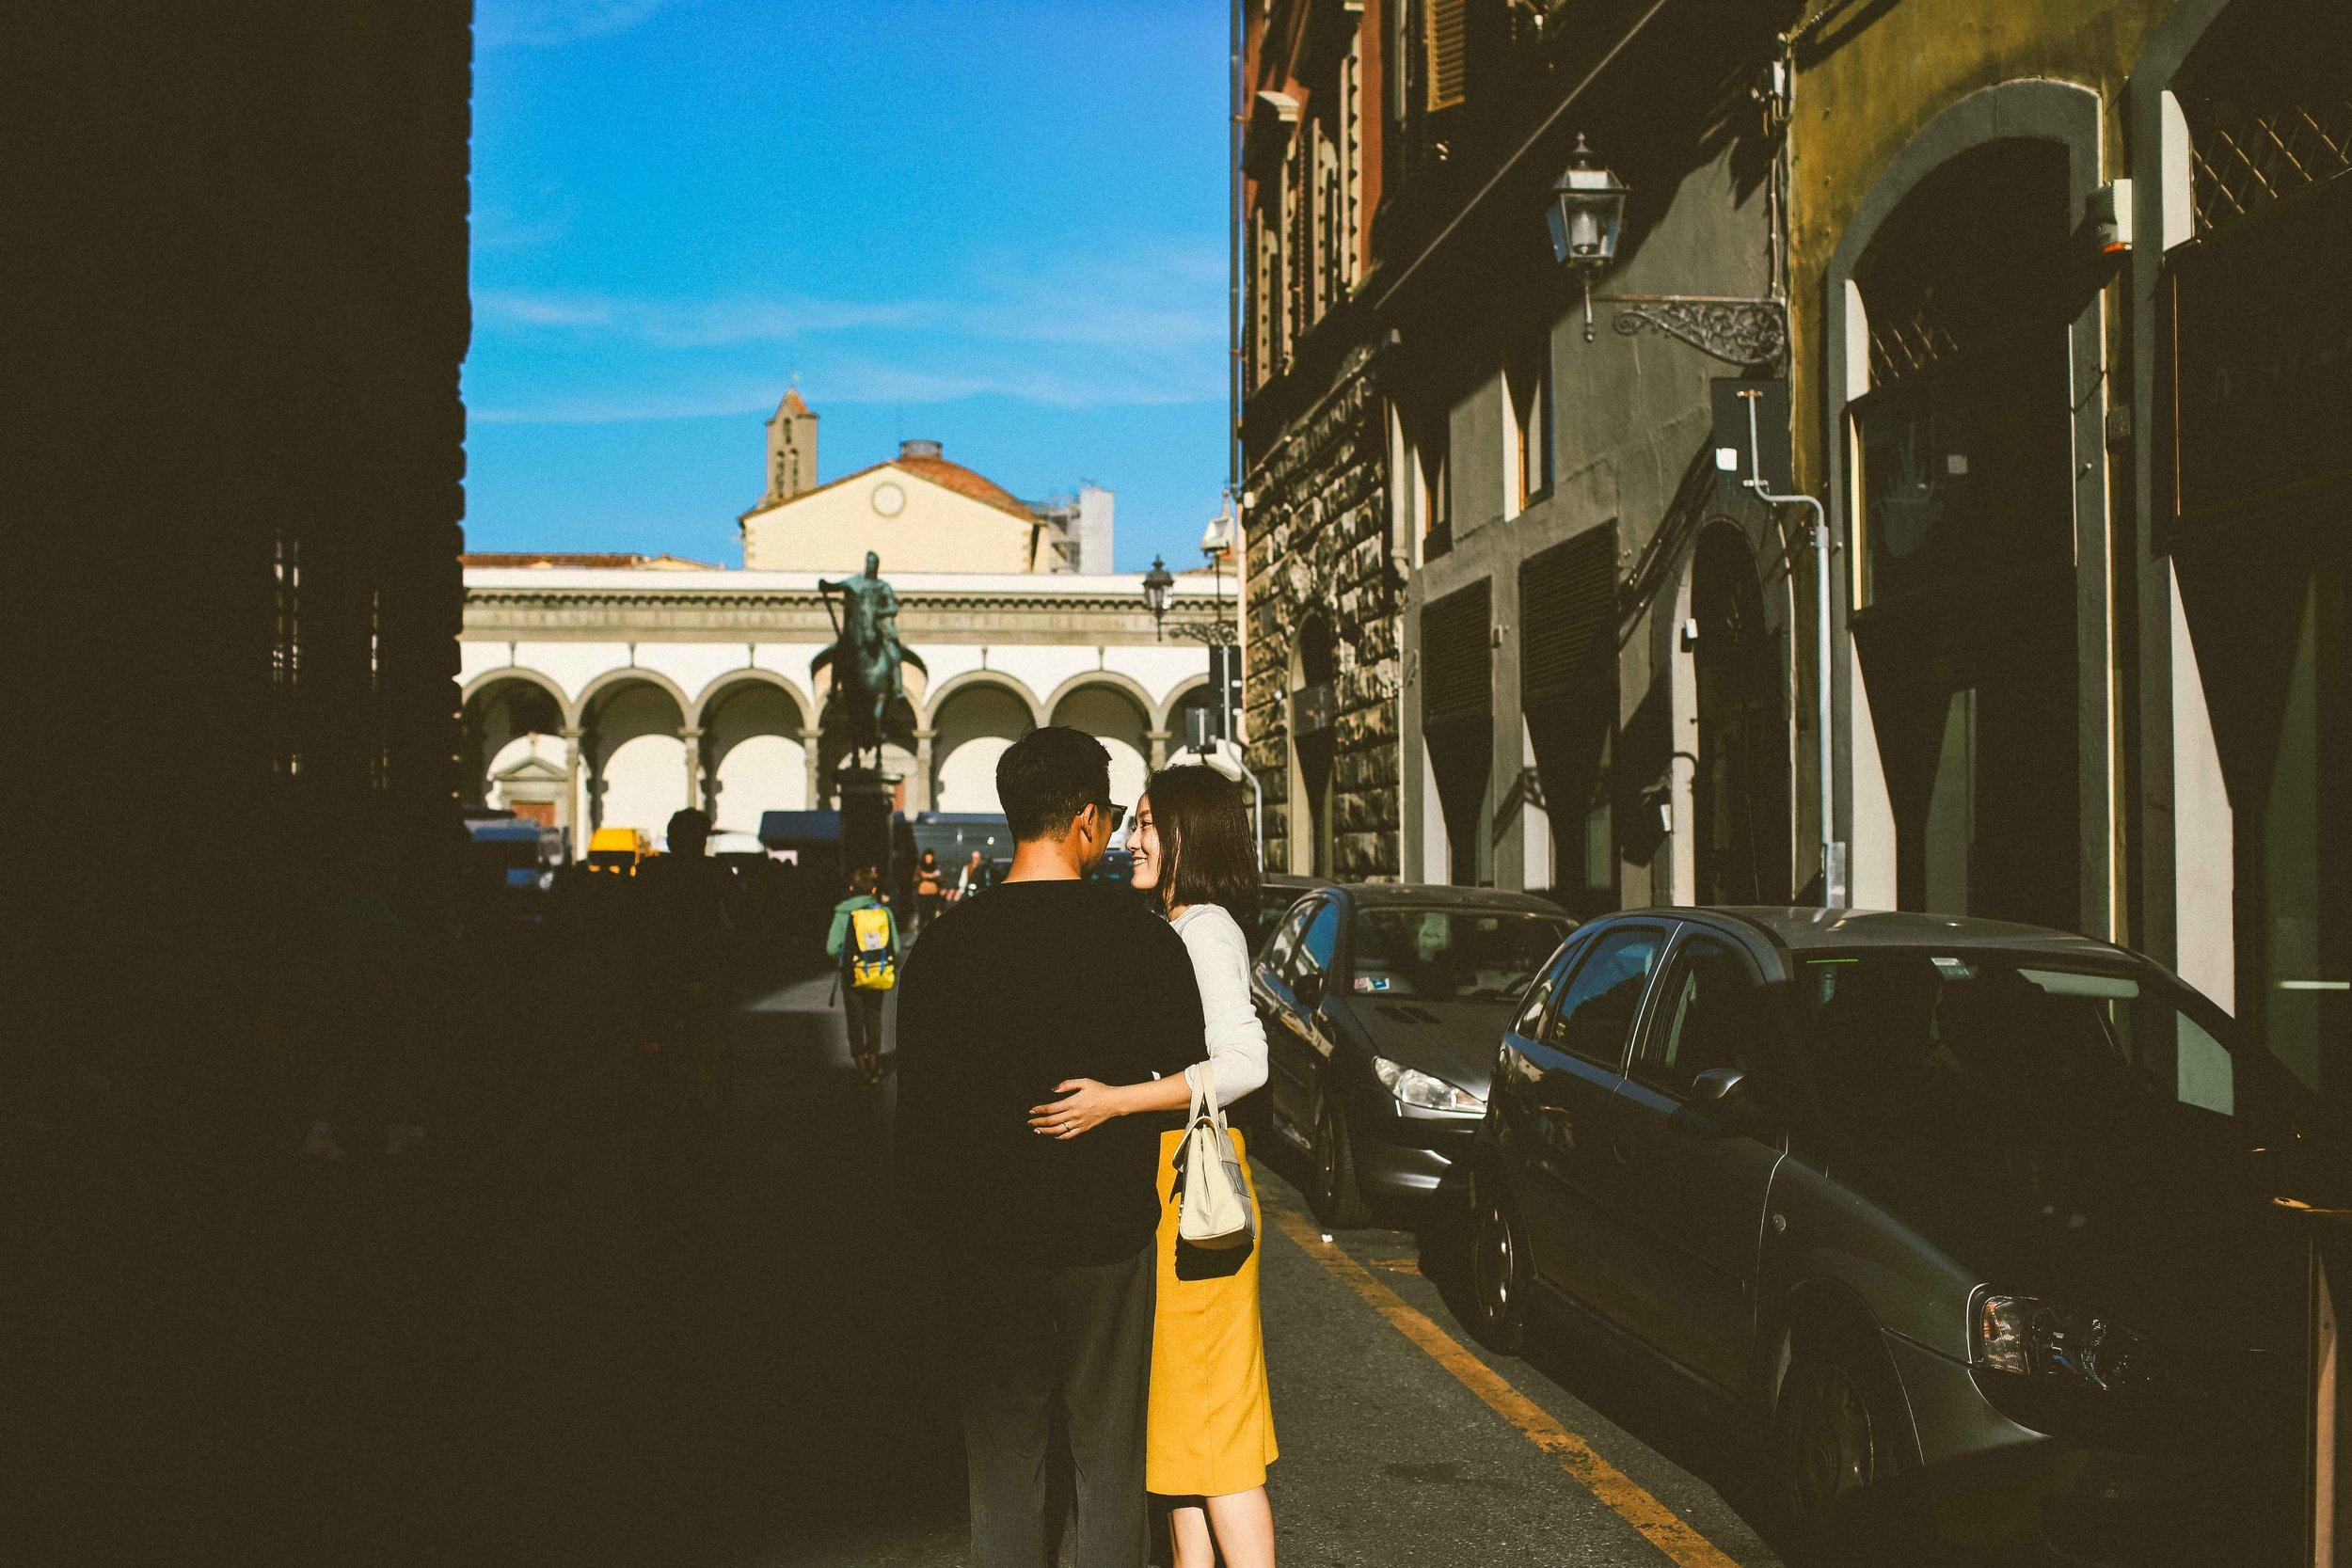 International_Street_Photographer.jpg